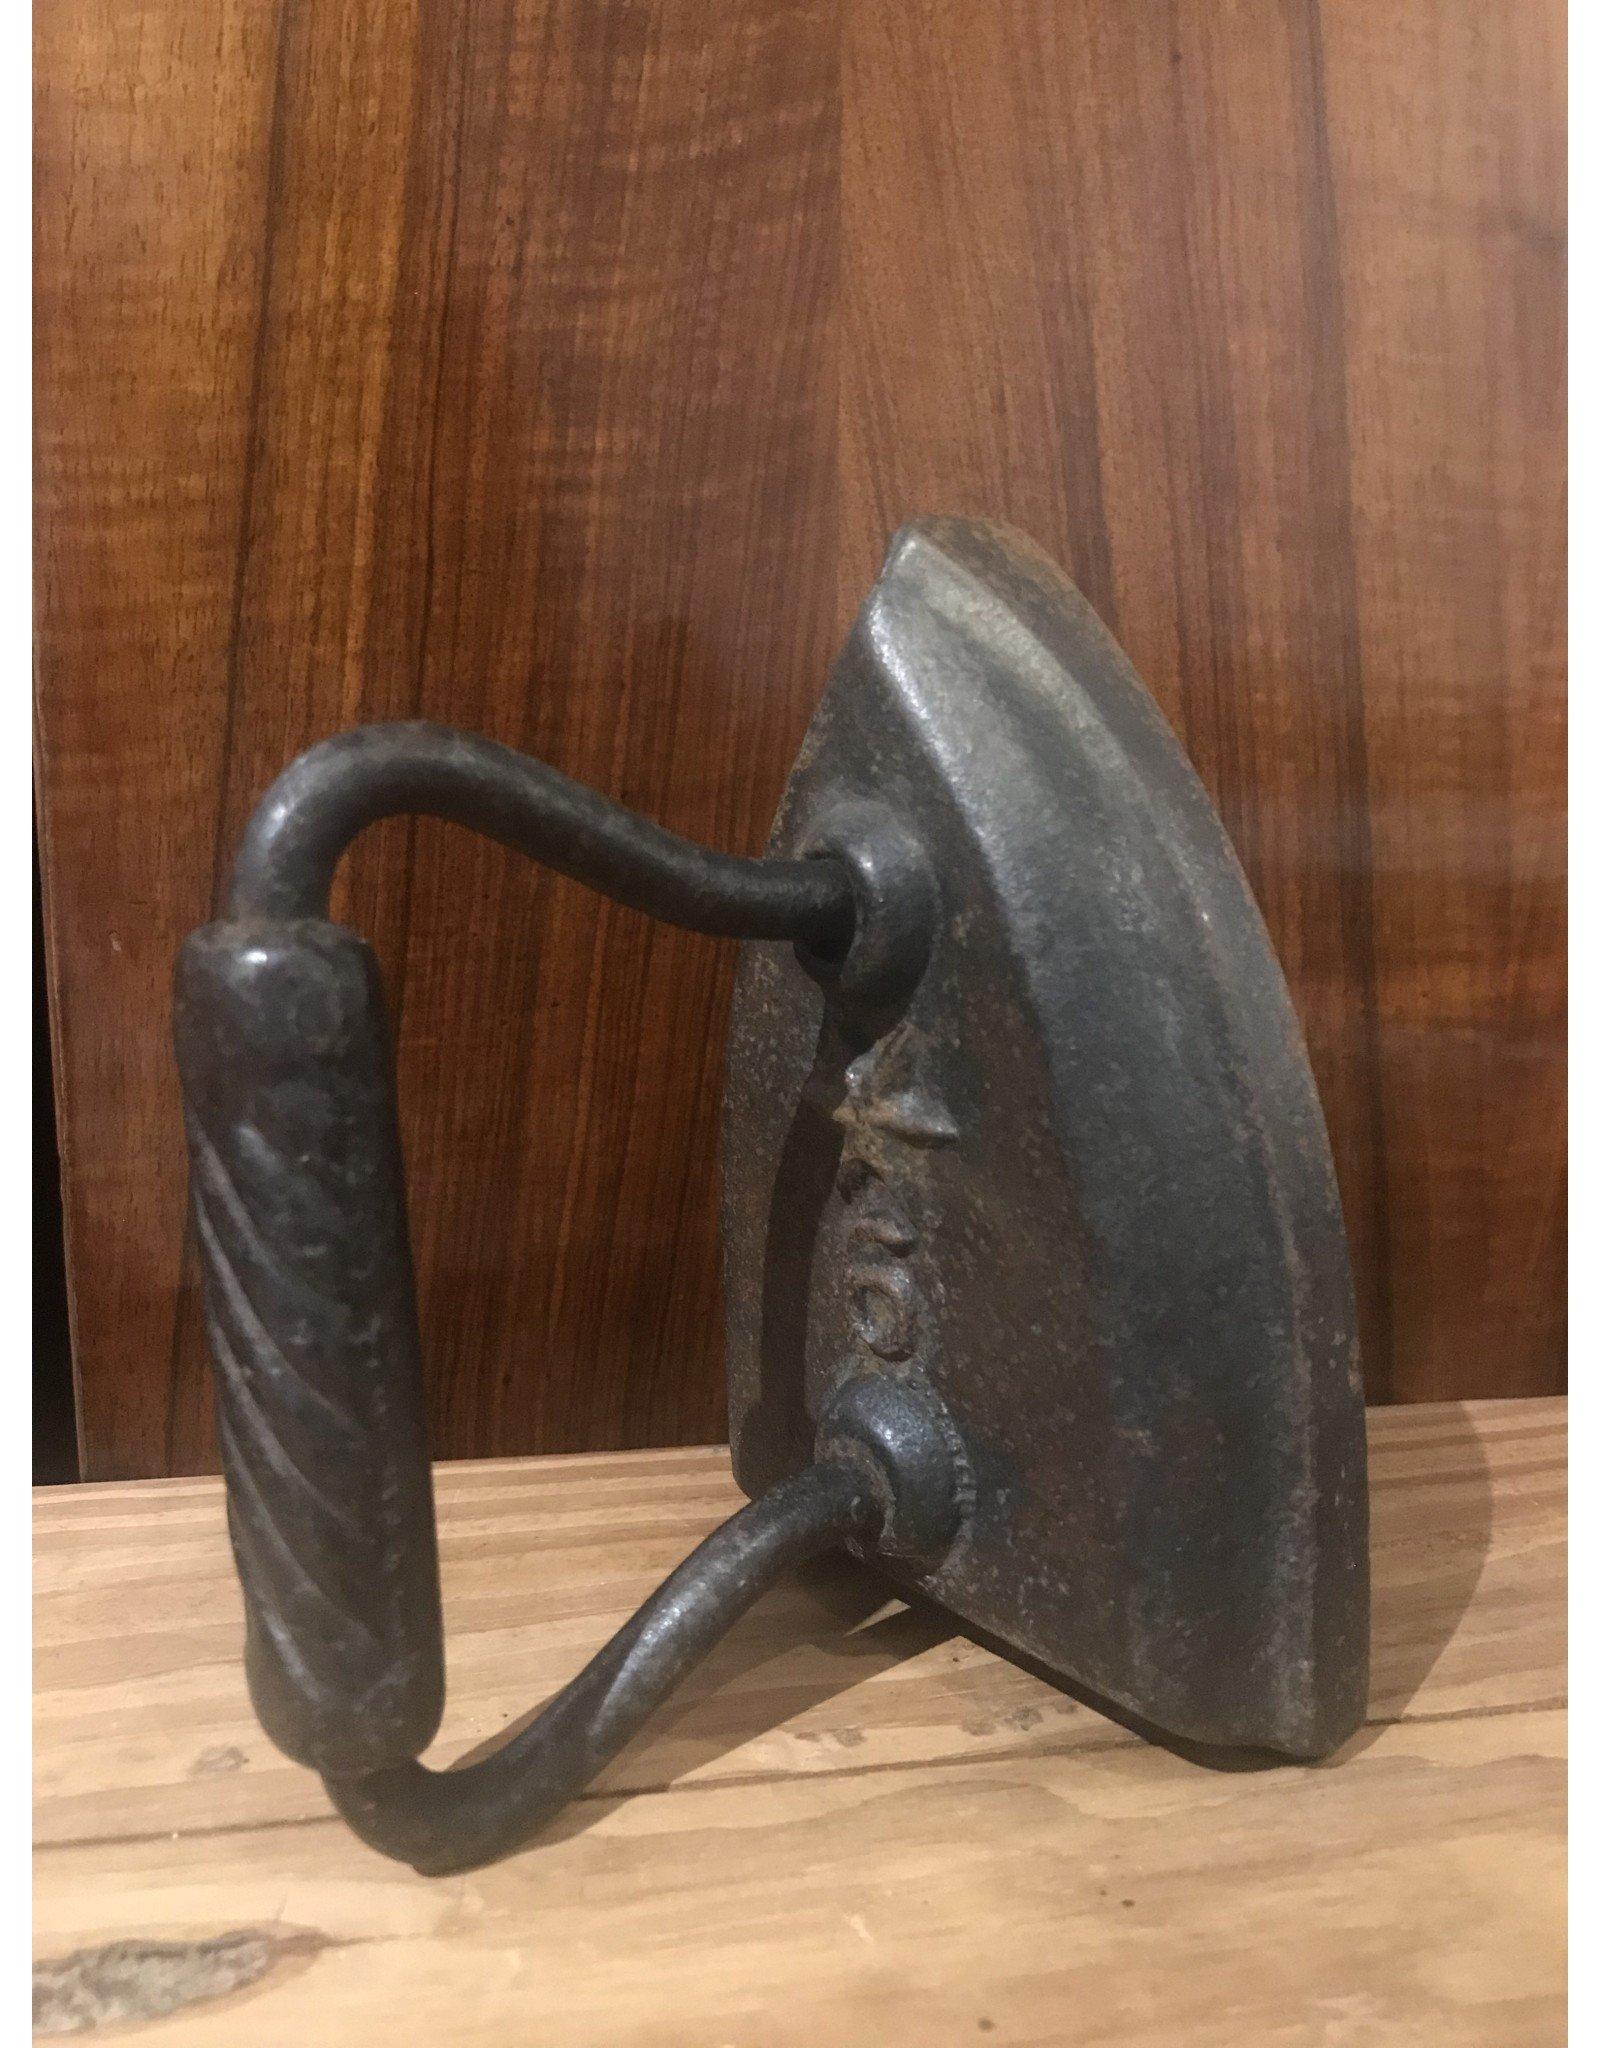 SPV Vintage irons